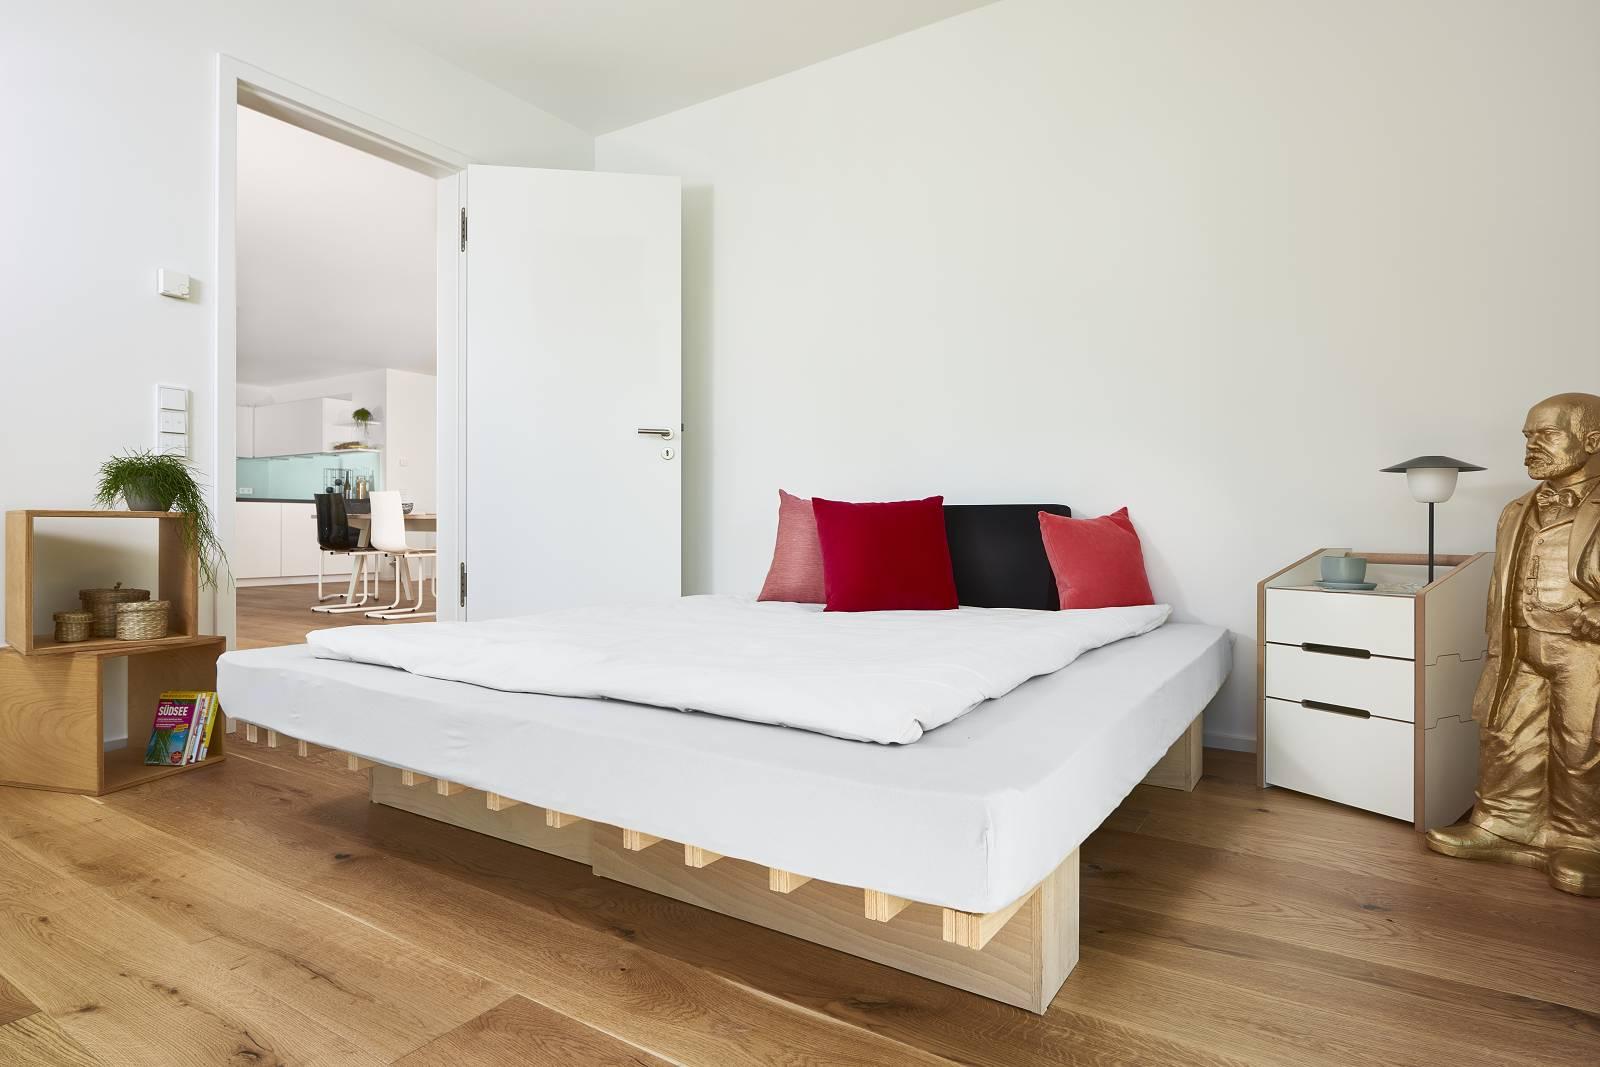 Full Size of Tojo V Bett Matratzen Lieg Bewertung Bett  System Gebraucht Gestell Erfahrungen Kaufen Erfahrung V Bett Bettgestell (180 X 190 Cm) Test Selber Bauen Bett Tojo V Bett